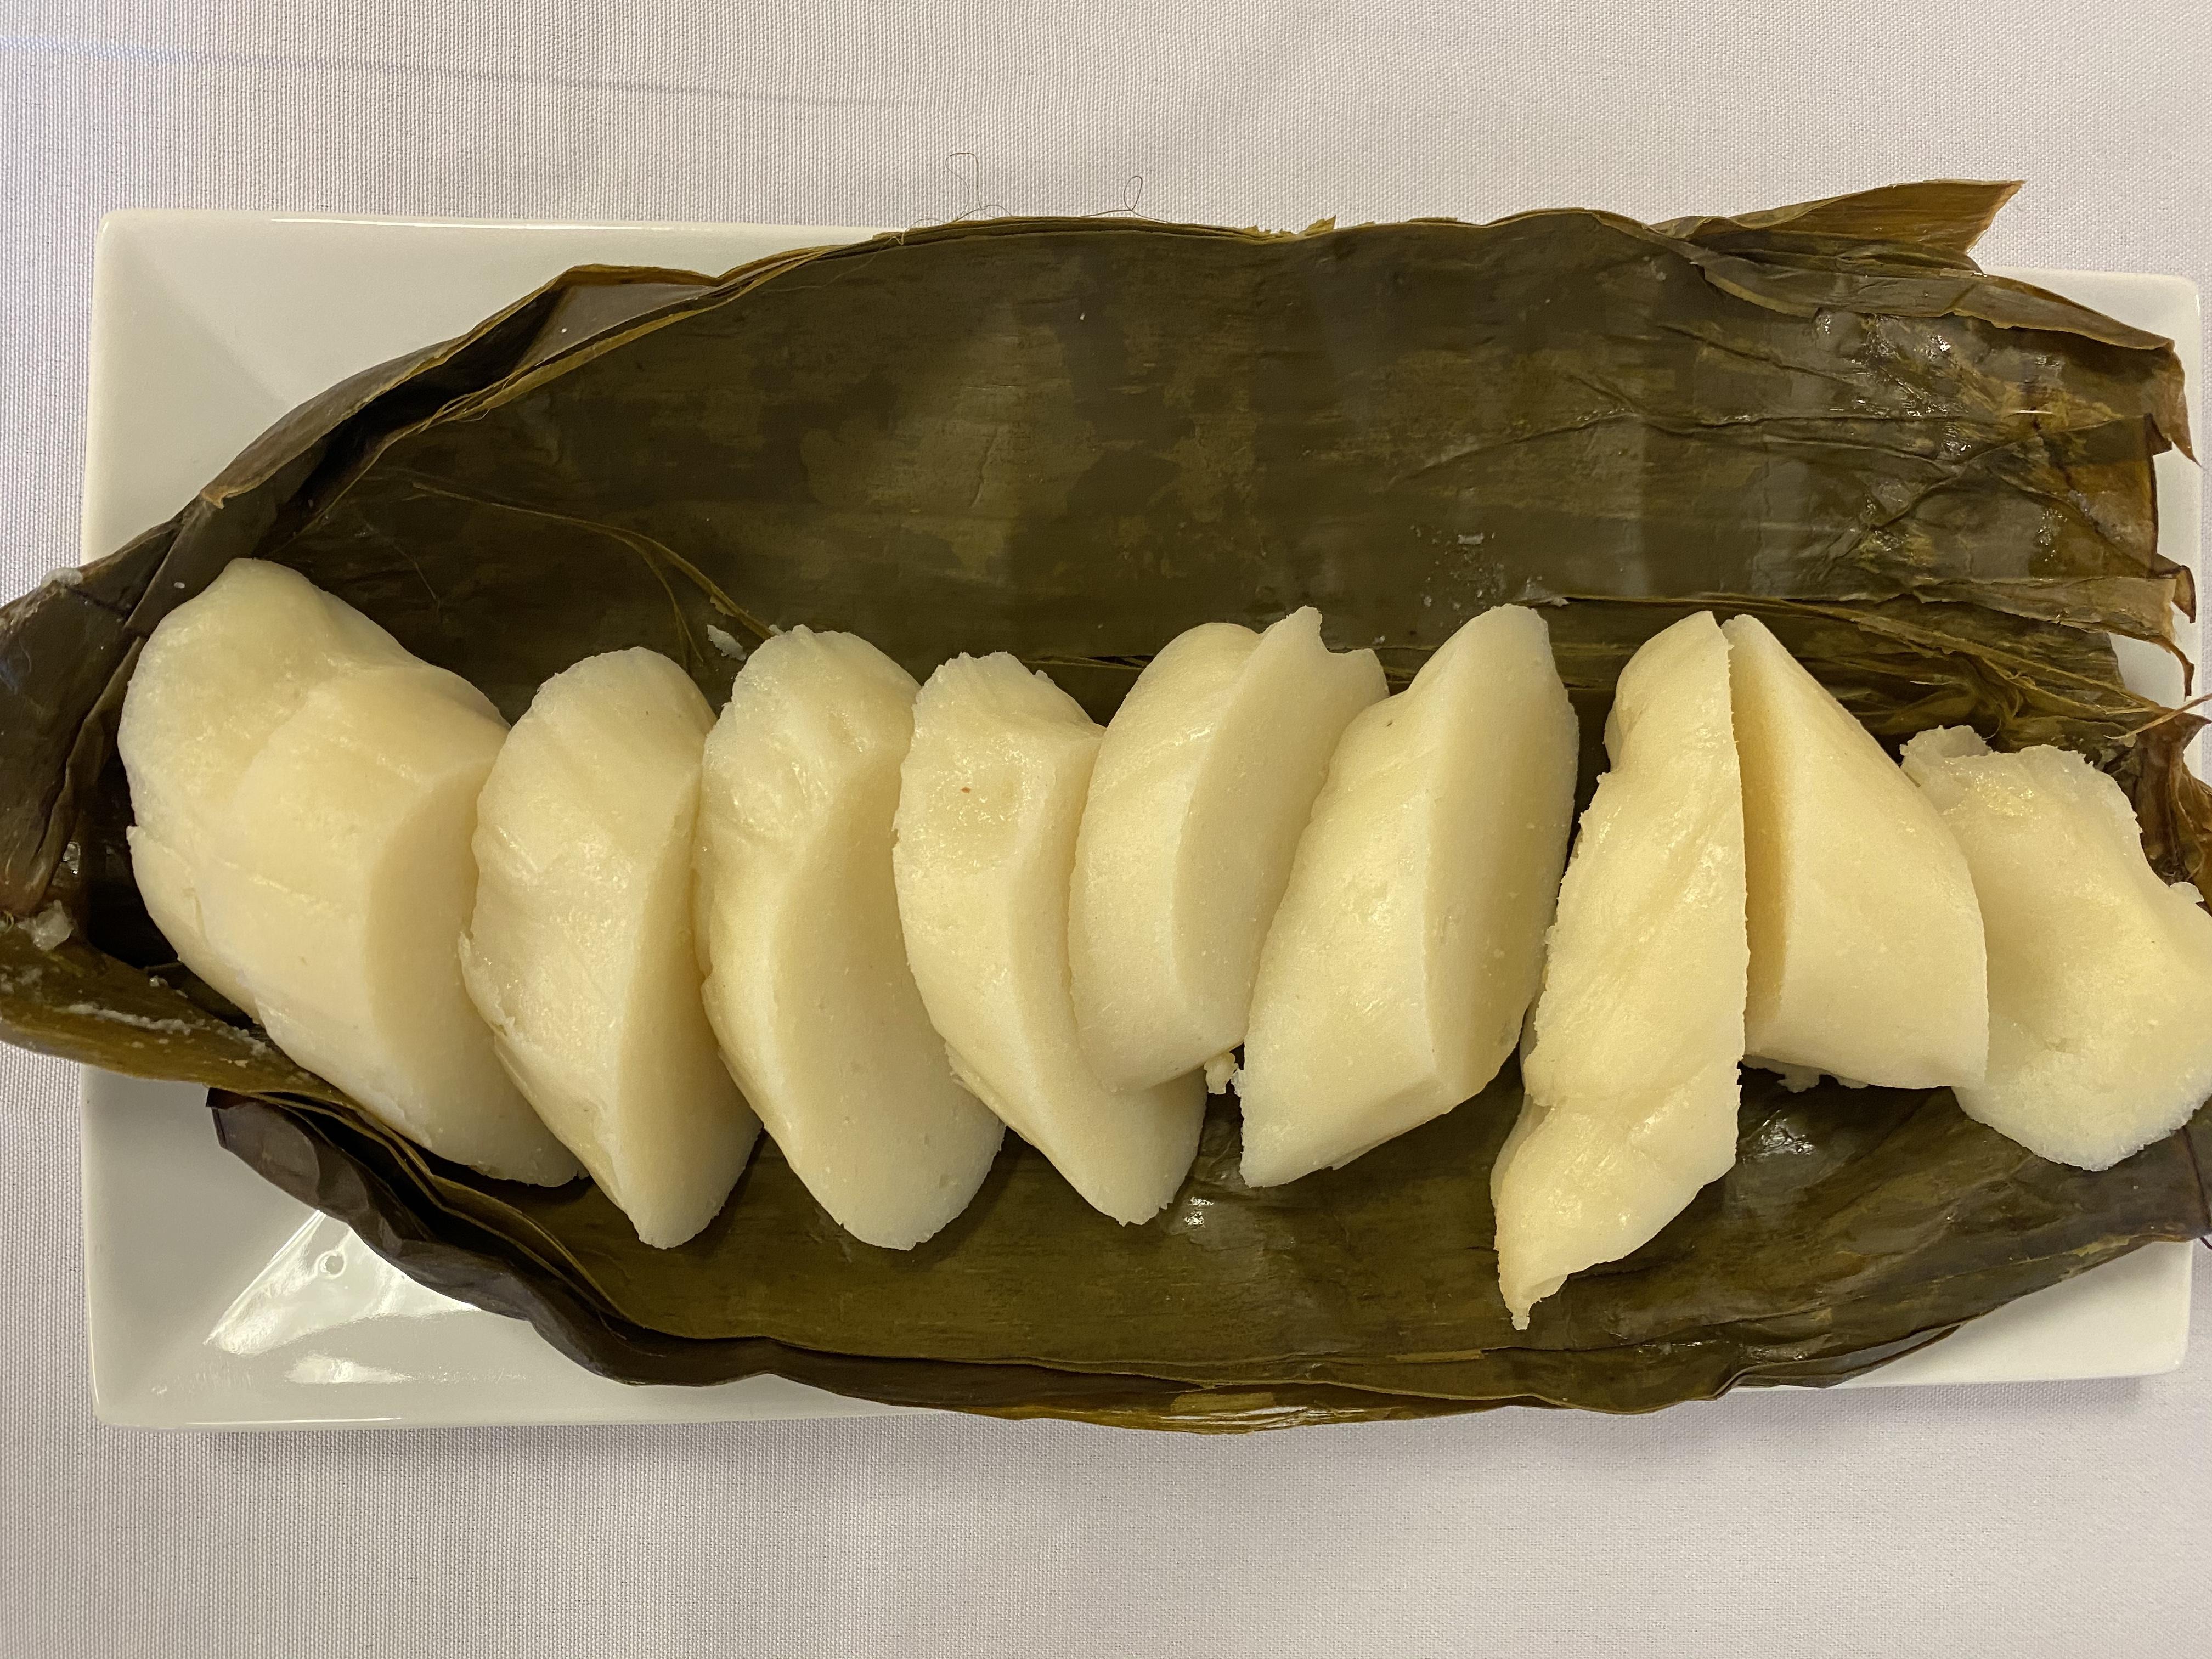 Kwanga (Hard, cooked cassava flour)